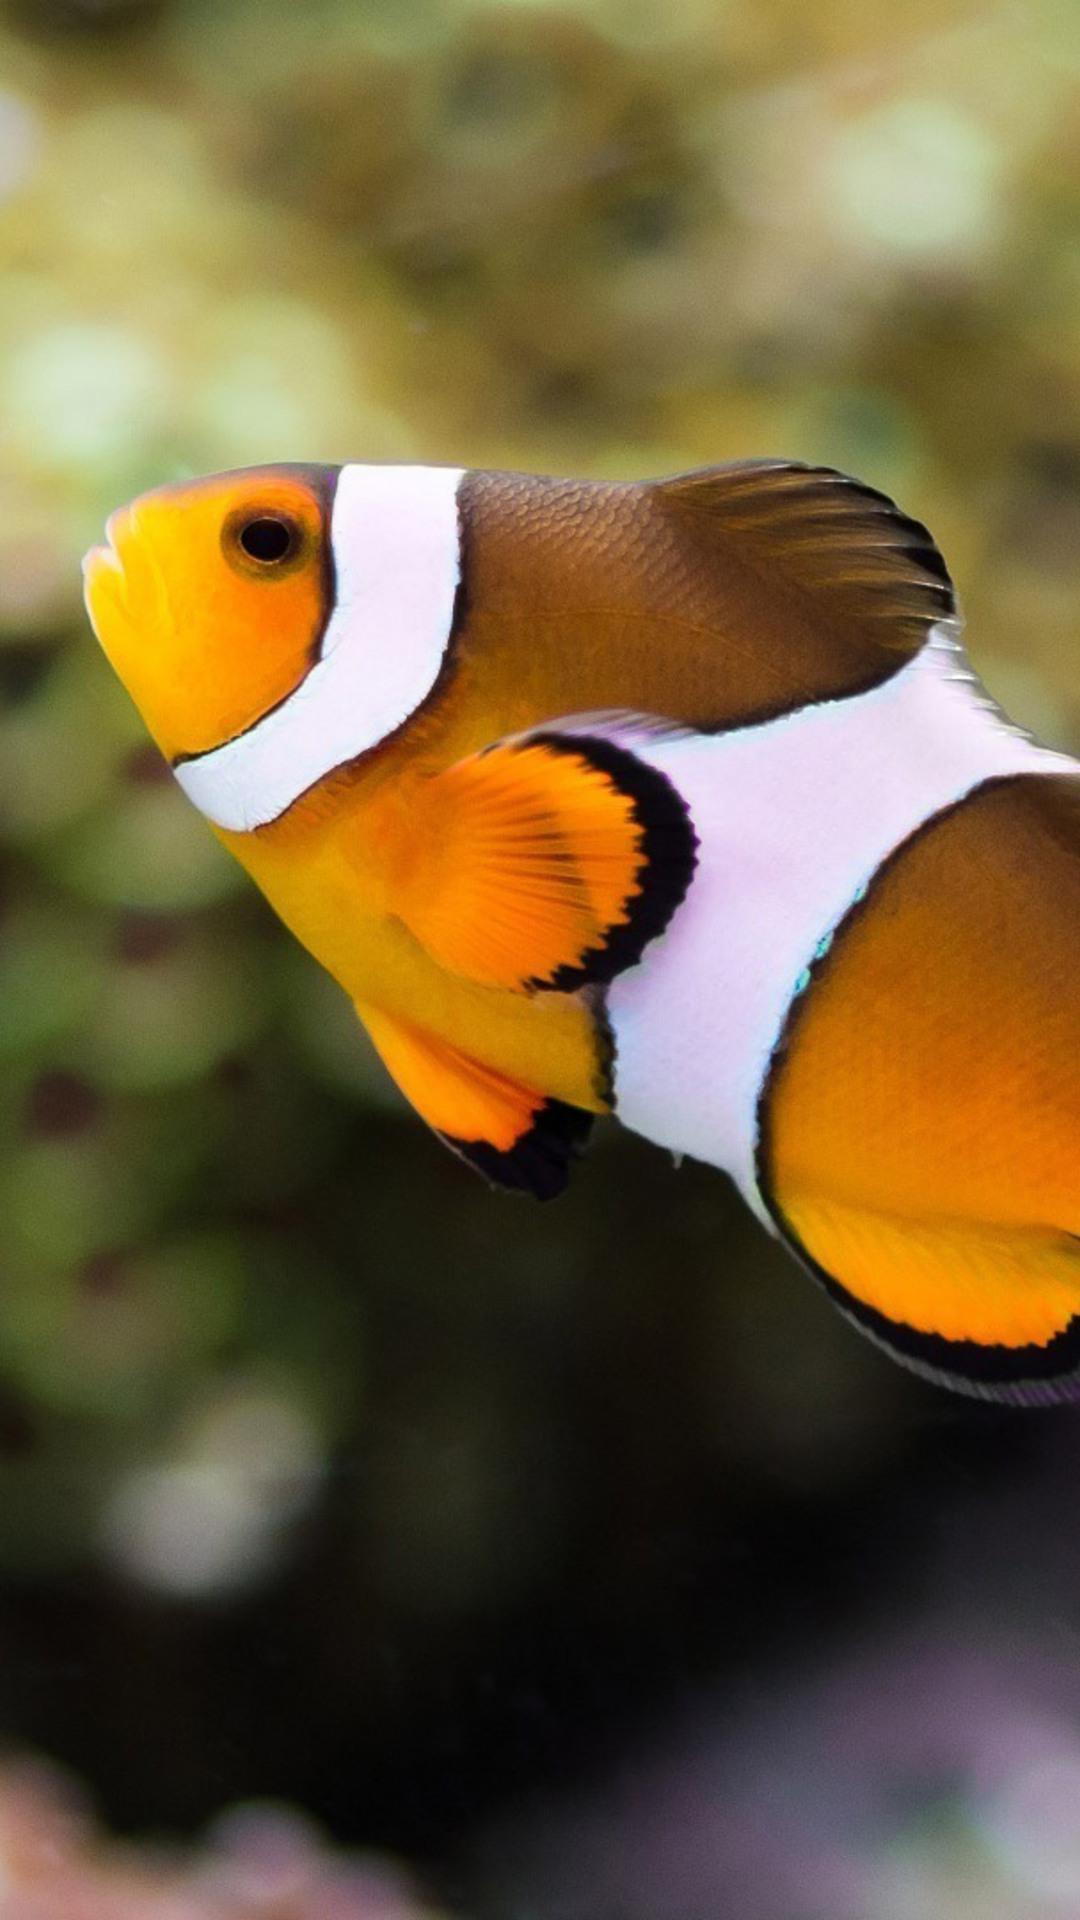 Apple Clownfish Wallpaper Iphone X 1080x1920 Clownfish Iphone 7 6s 6 Plus Pixel Xl One Plus